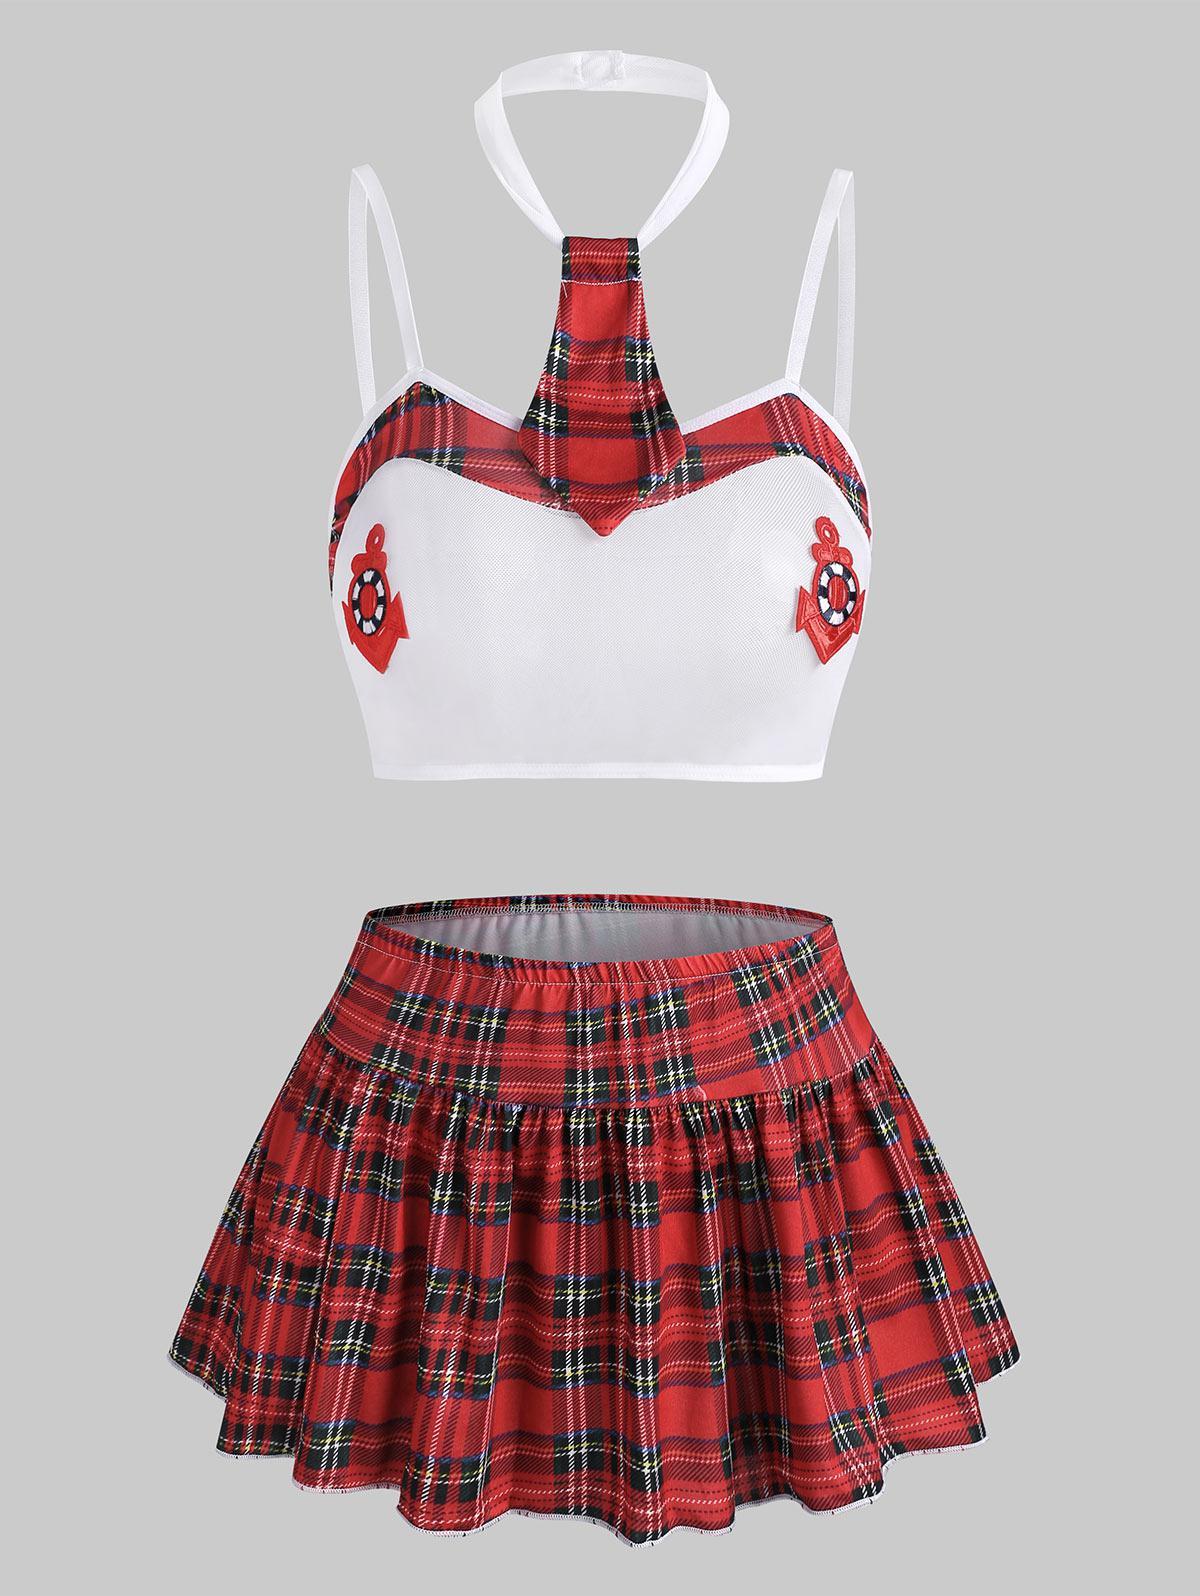 Plaid Mesh See Thru Bralette Set with Skirt